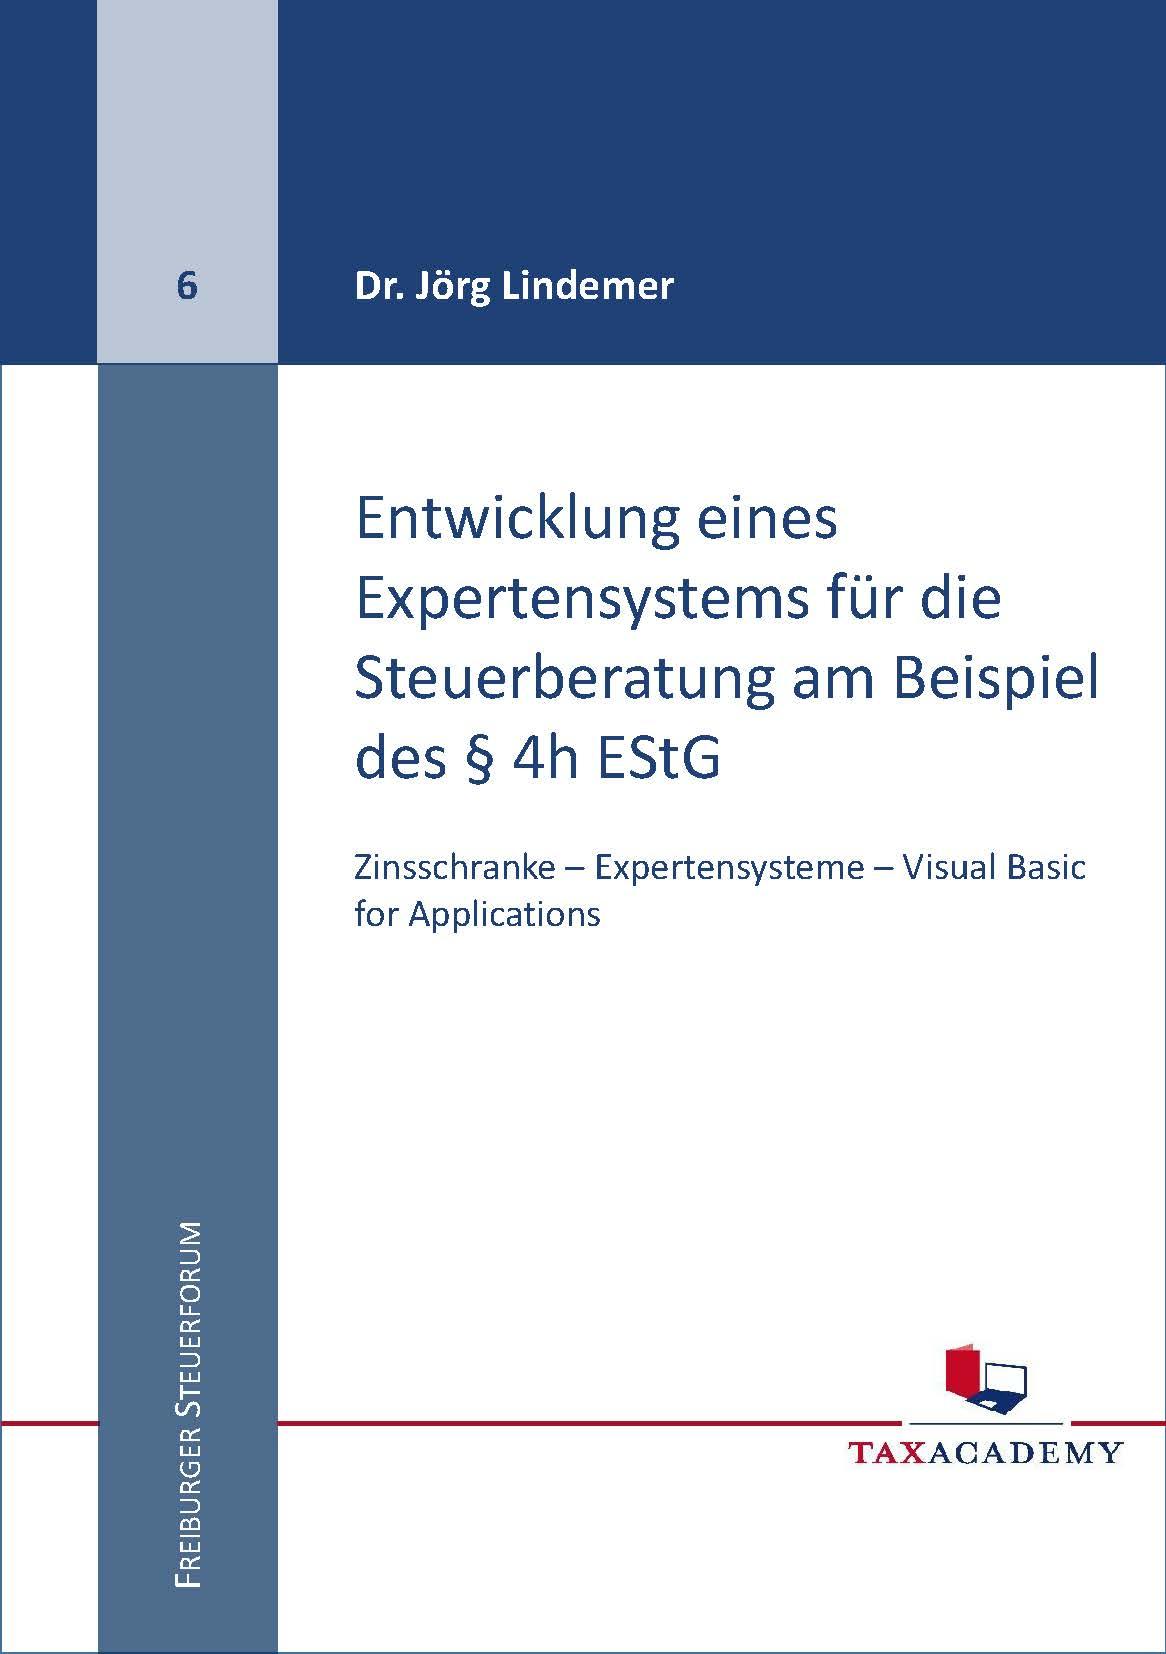 Buchumschlag_TaxAcademy_Lindemer_final_Seite_1